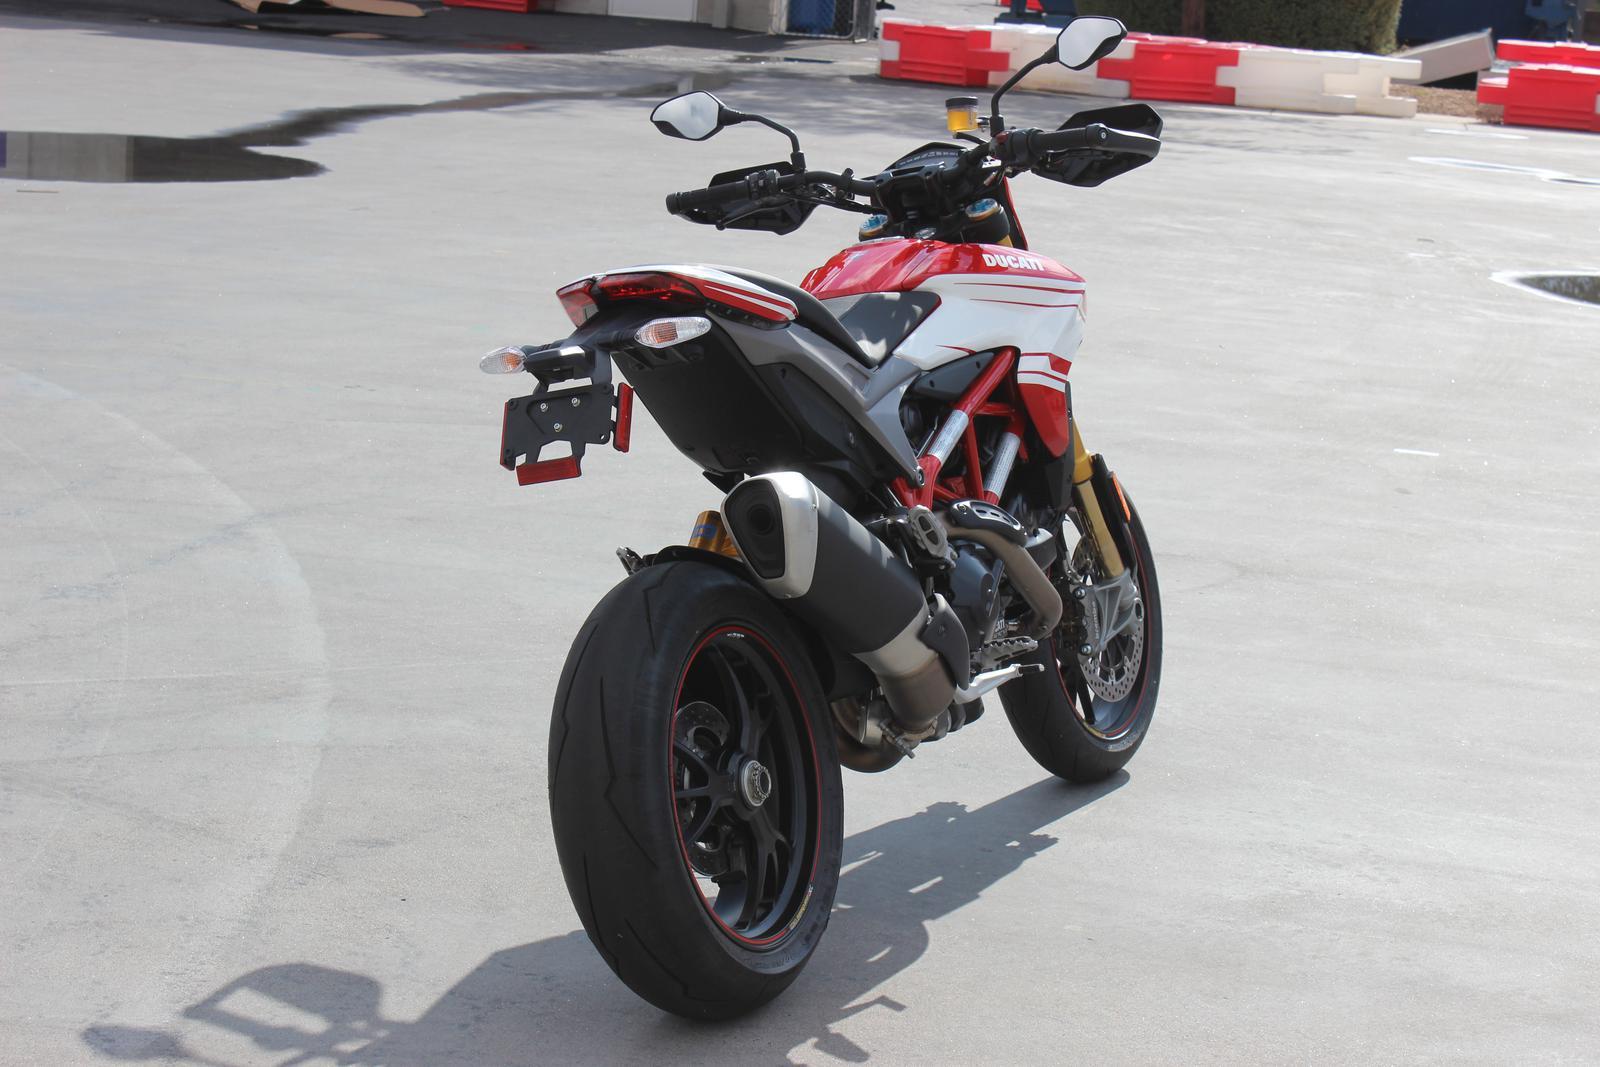 2018 Ducati Hypermotard 939 SP for sale in Scottsdale, AZ. GO AZ ...